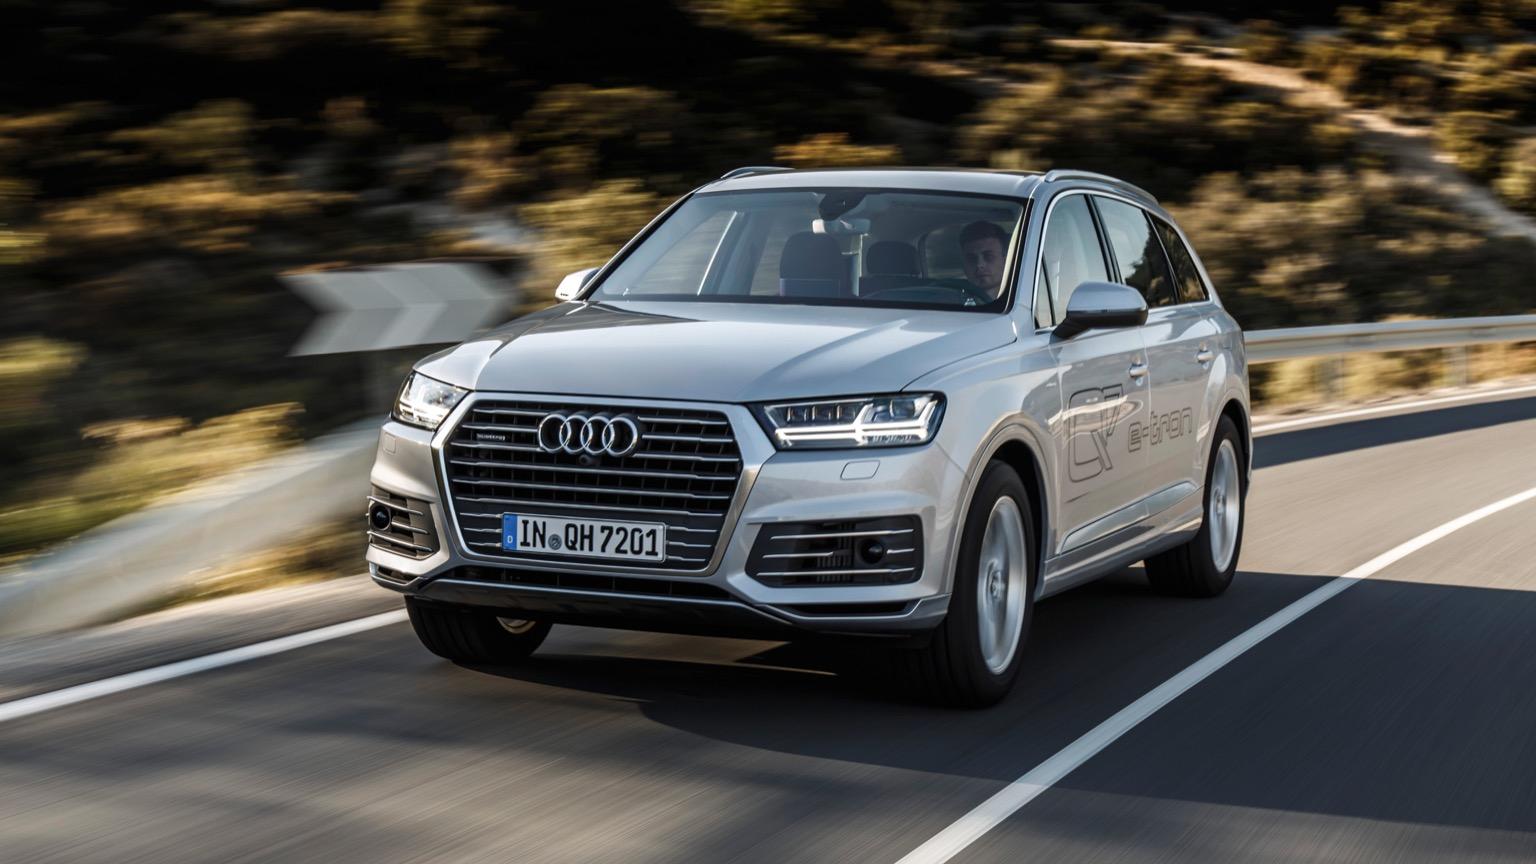 Audi Q7 e-tron (2016)